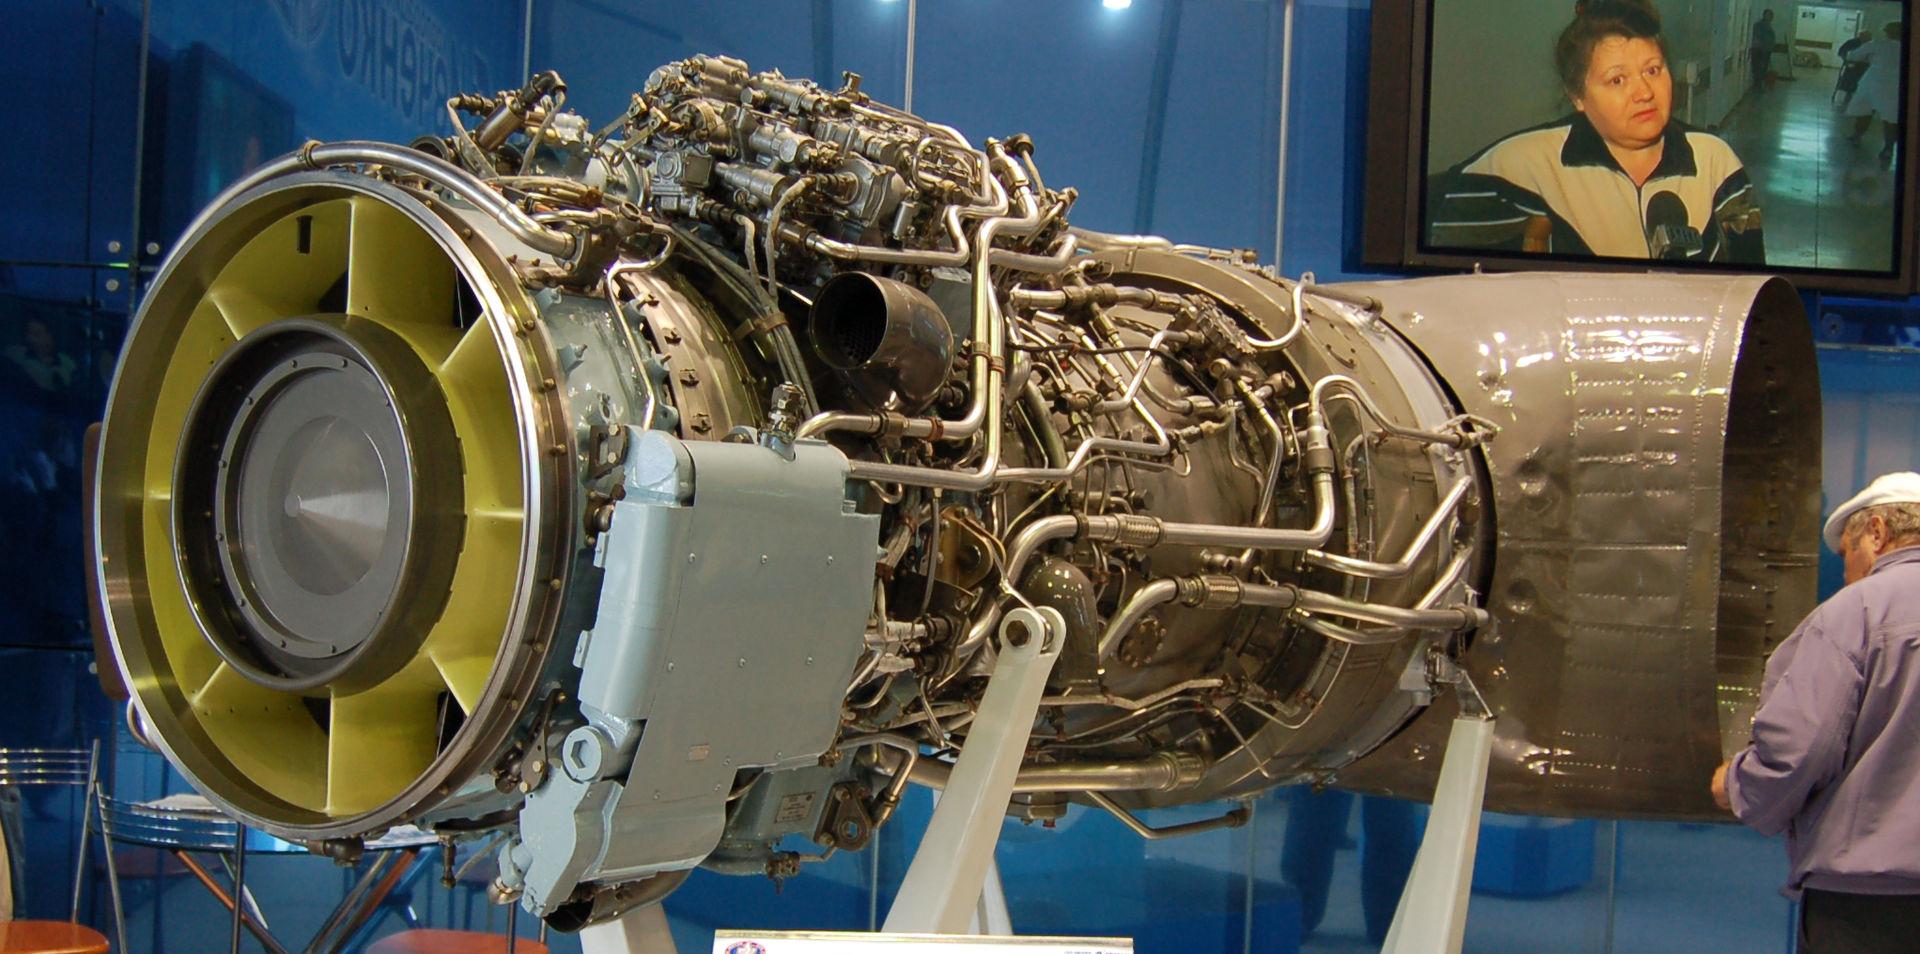 D136_engine_maks2009